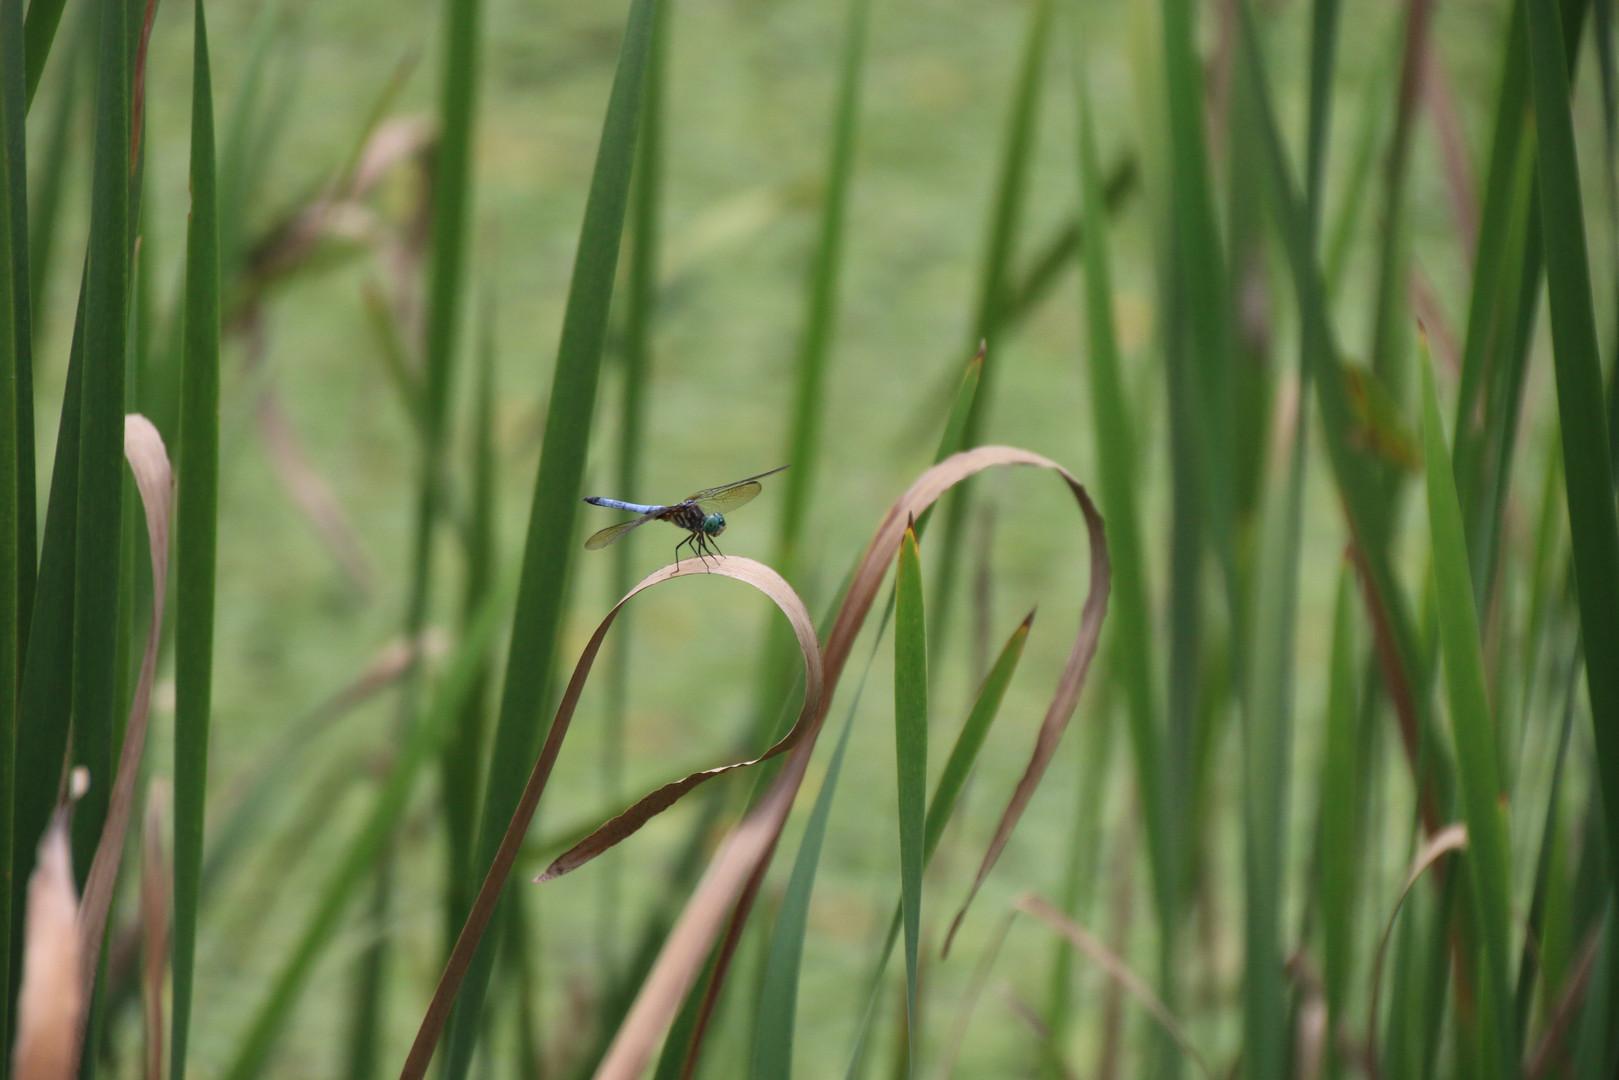 Dragon fly lower pond 2016